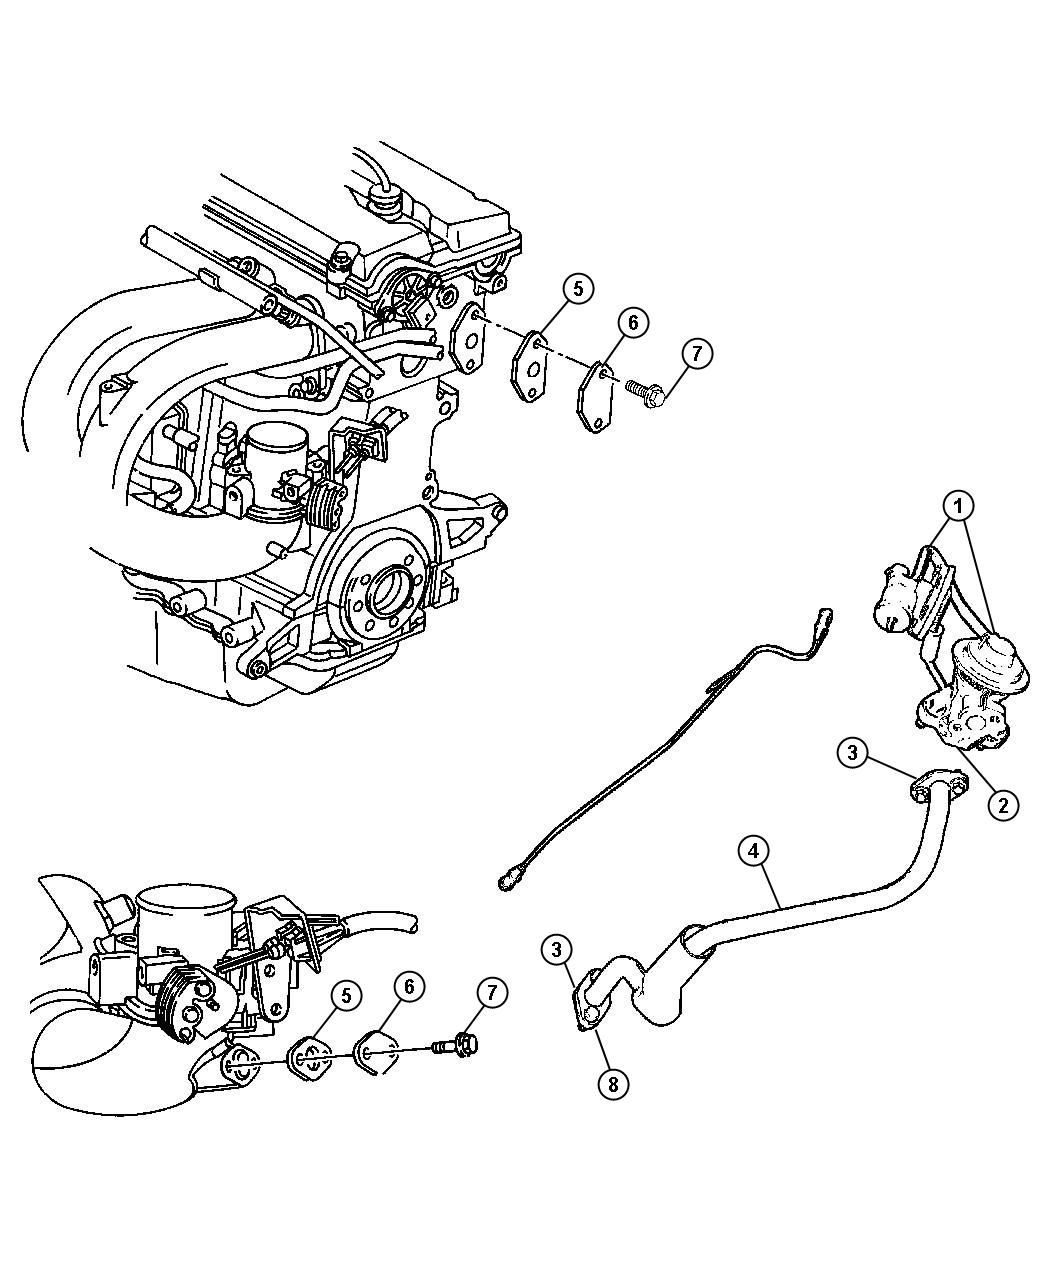 2005 Dodge Caravan Tube. Egr. System, related, mopar